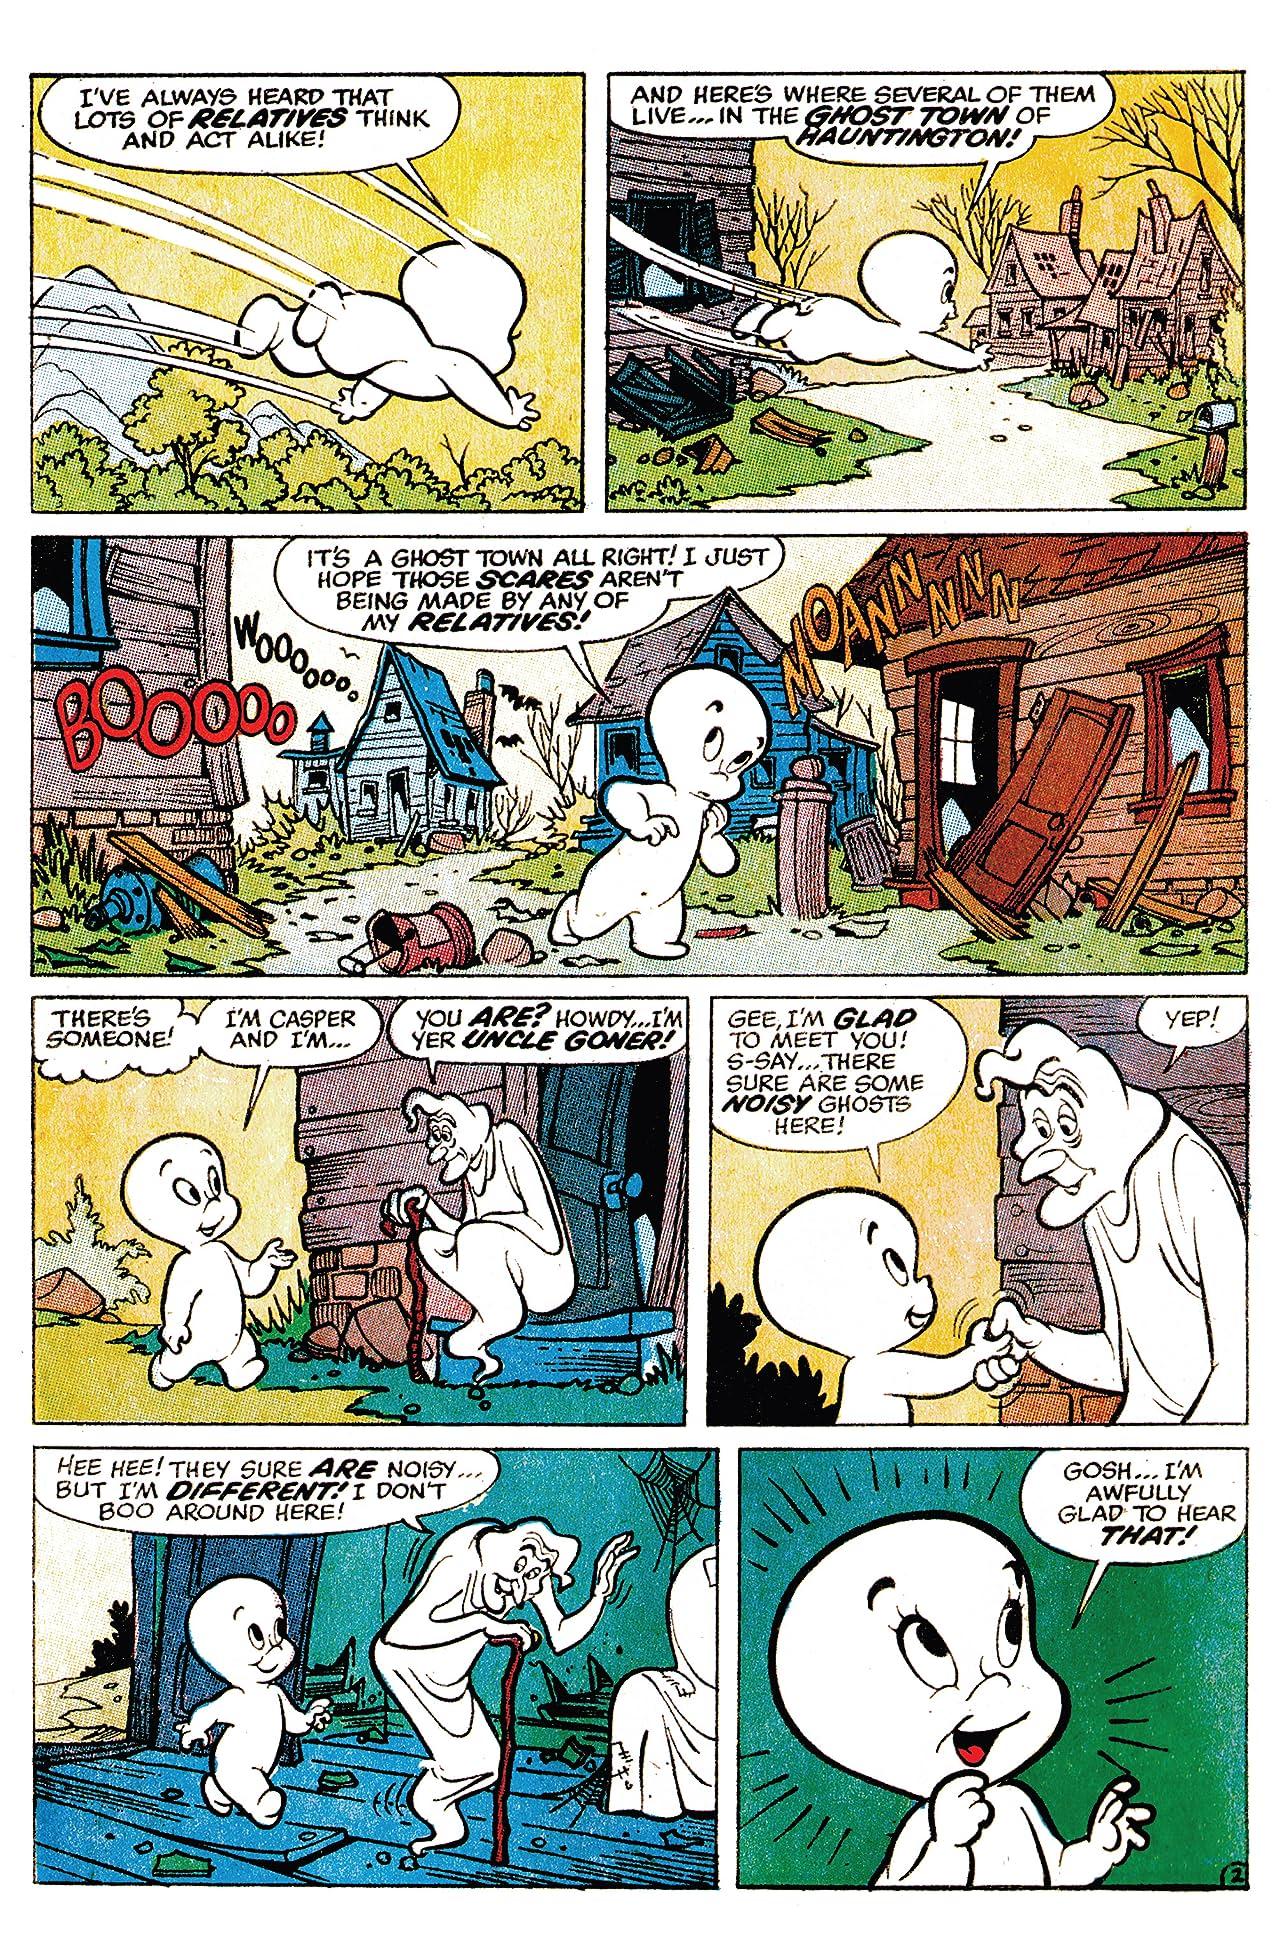 Casper the Friendly Ghost Classics TP Vol. 1